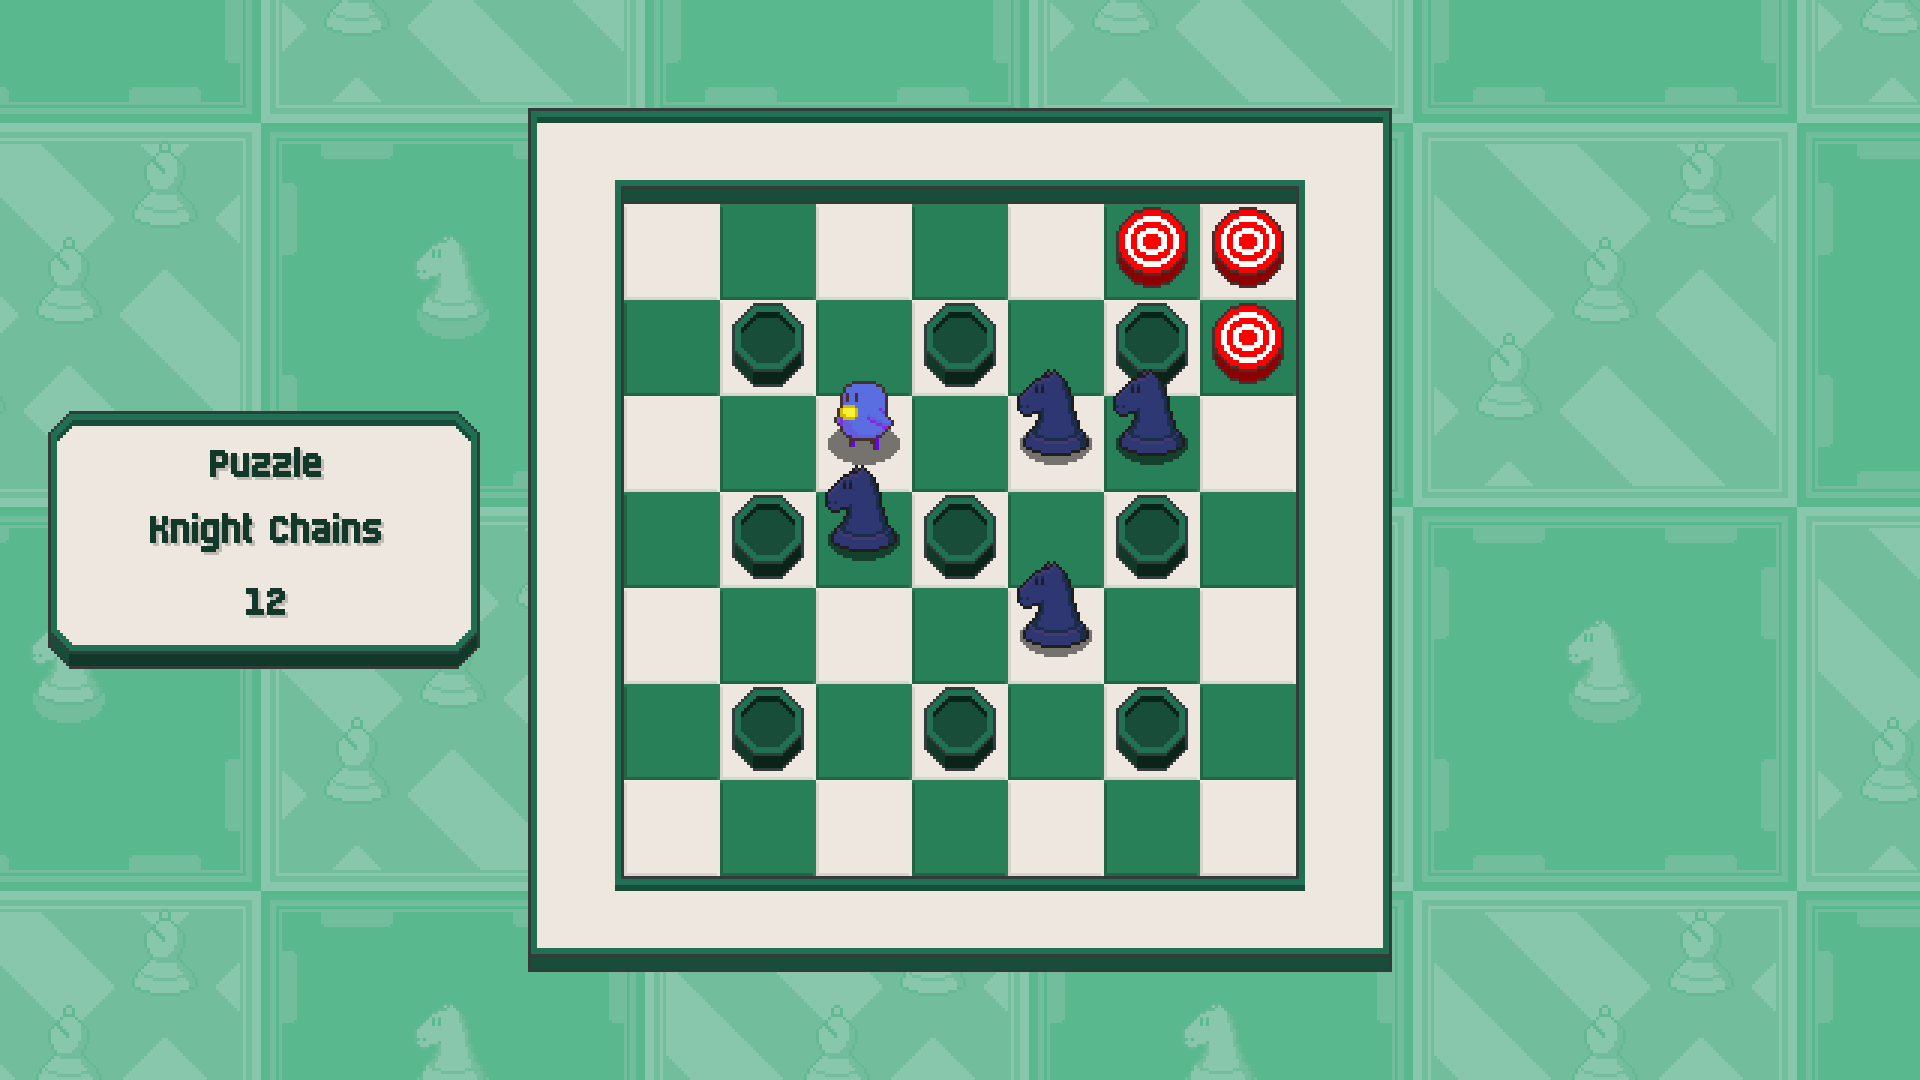 Chessplosion - Puzzle Solution Guide + Achievements Walkthrough - Advanced: Knight Chains - DC8CA6B